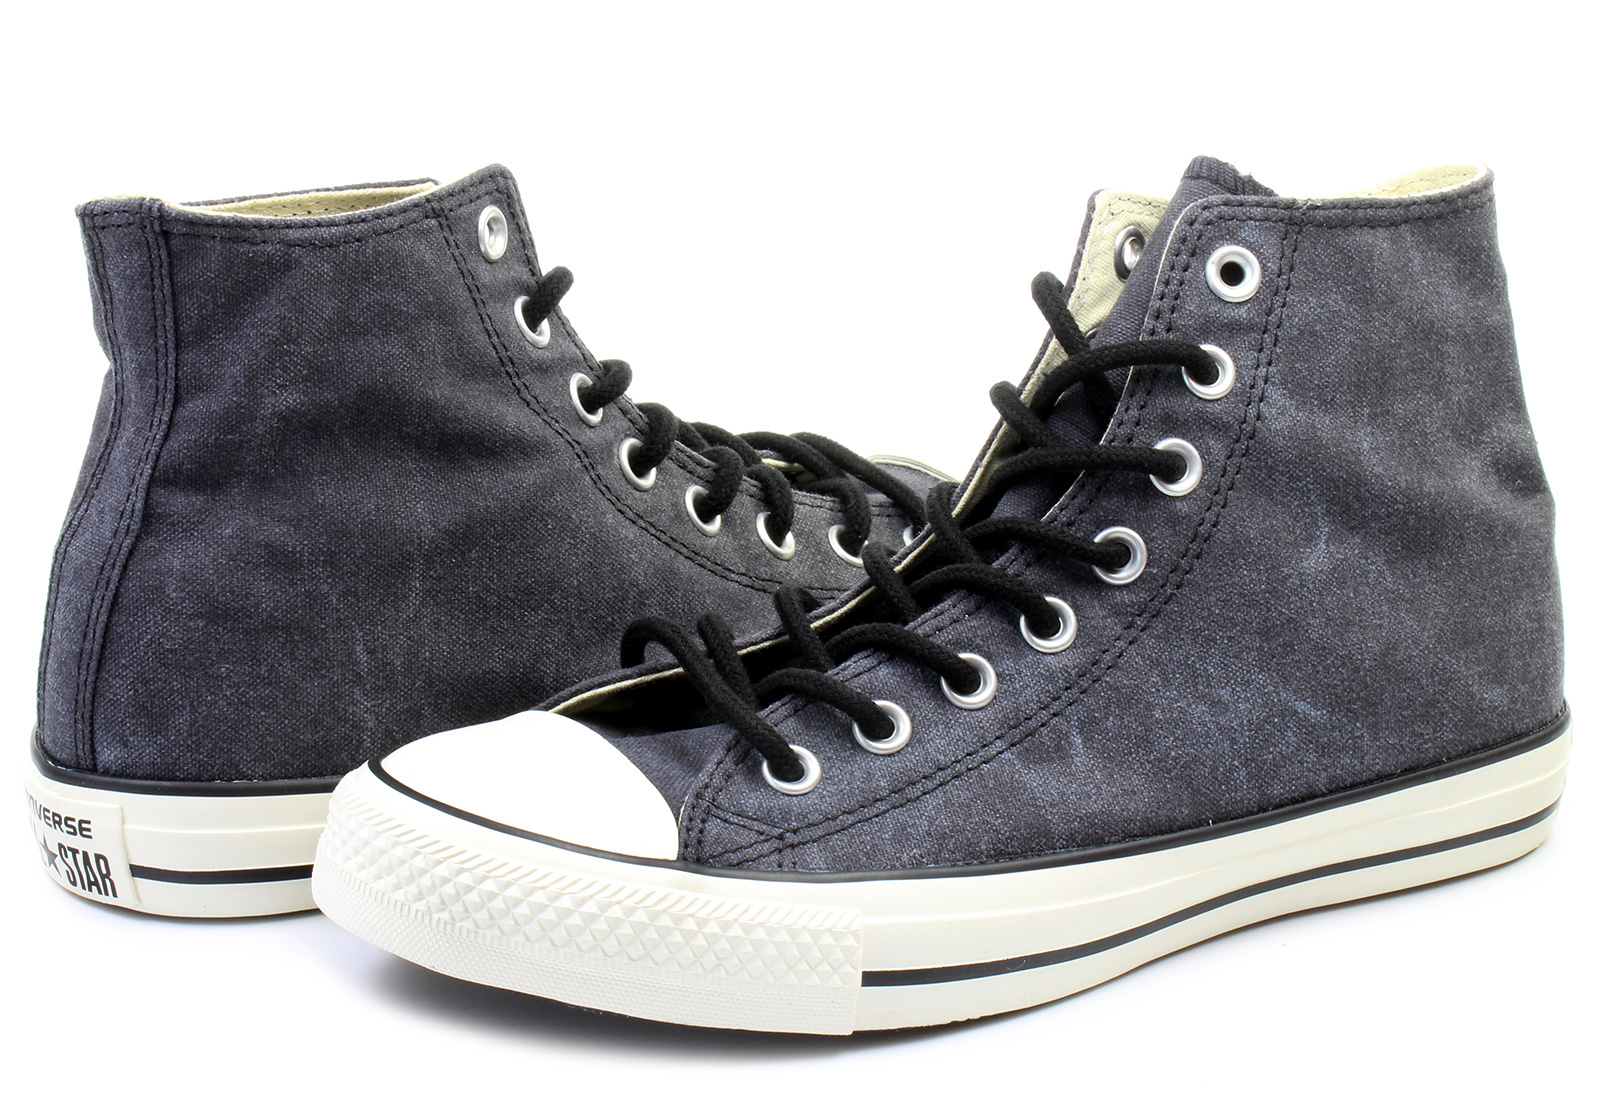 Converse Sneakers - Chuck Taylor All Star Distressed Hi - 144631C ... d65fb7b590